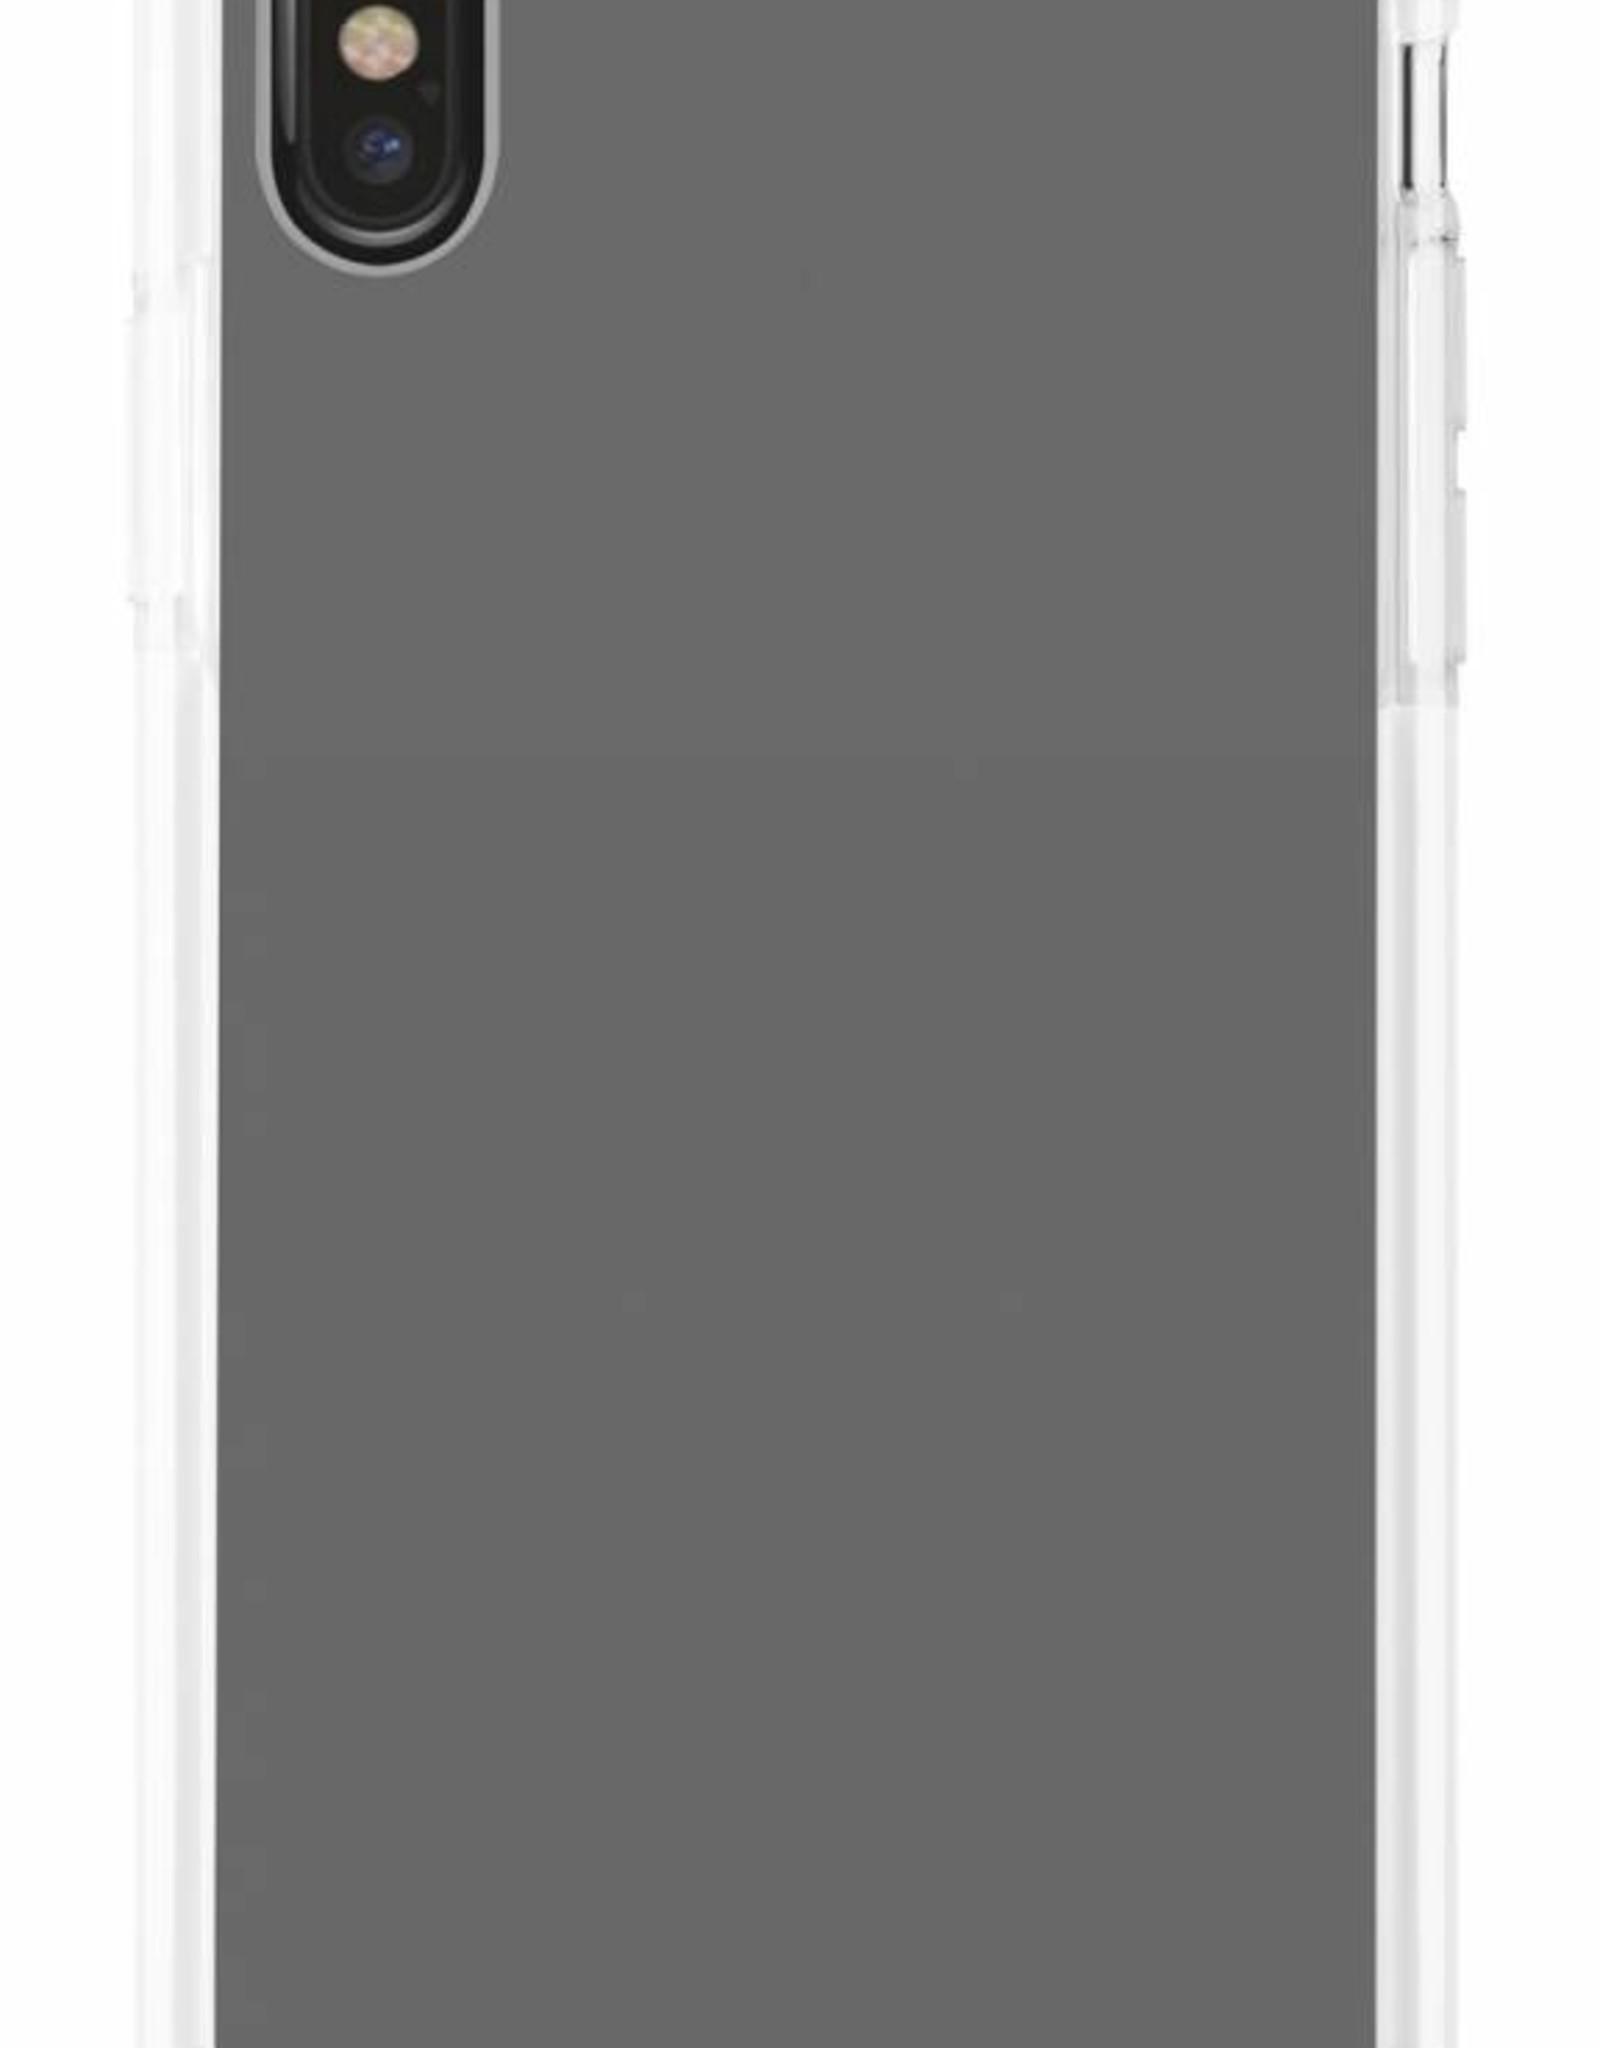 Blu Element Blu Element    iPhone X   DropZone Rugged White - 112-9551